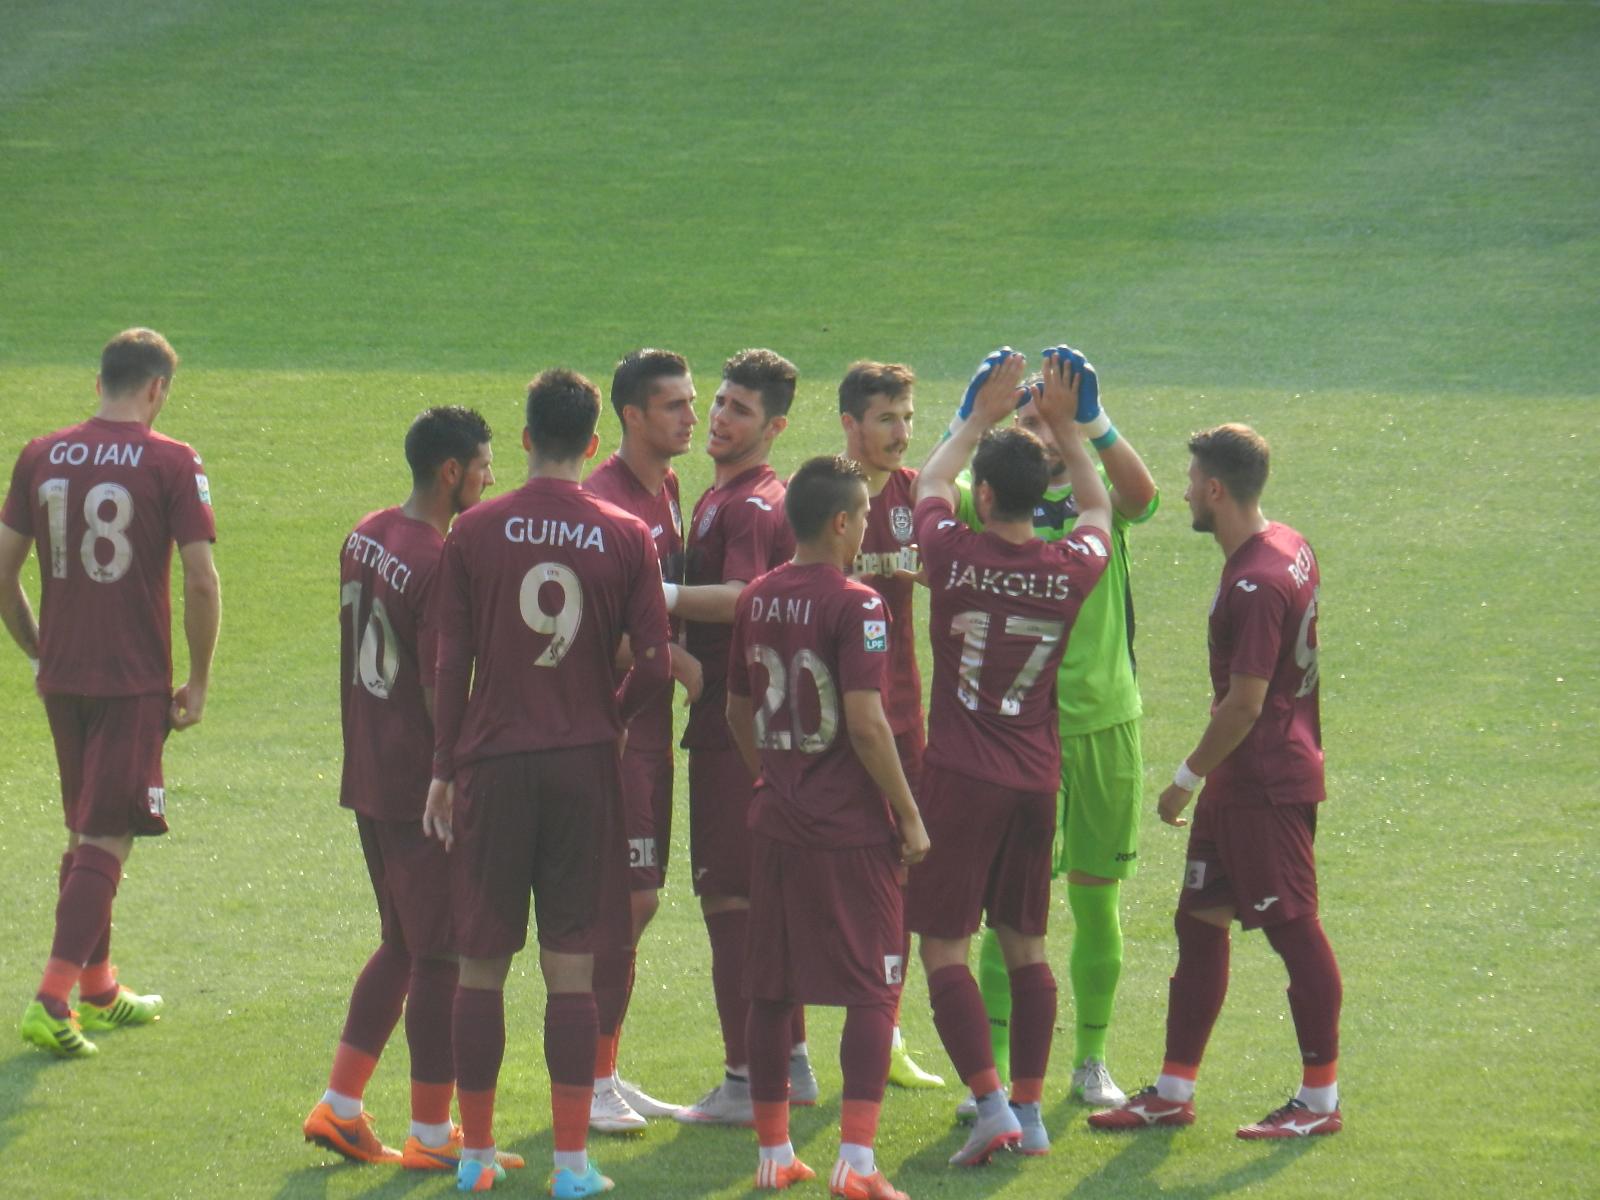 CFR Cluj - ACS Poli Timisoara, etapa 2 - 19.07.2015